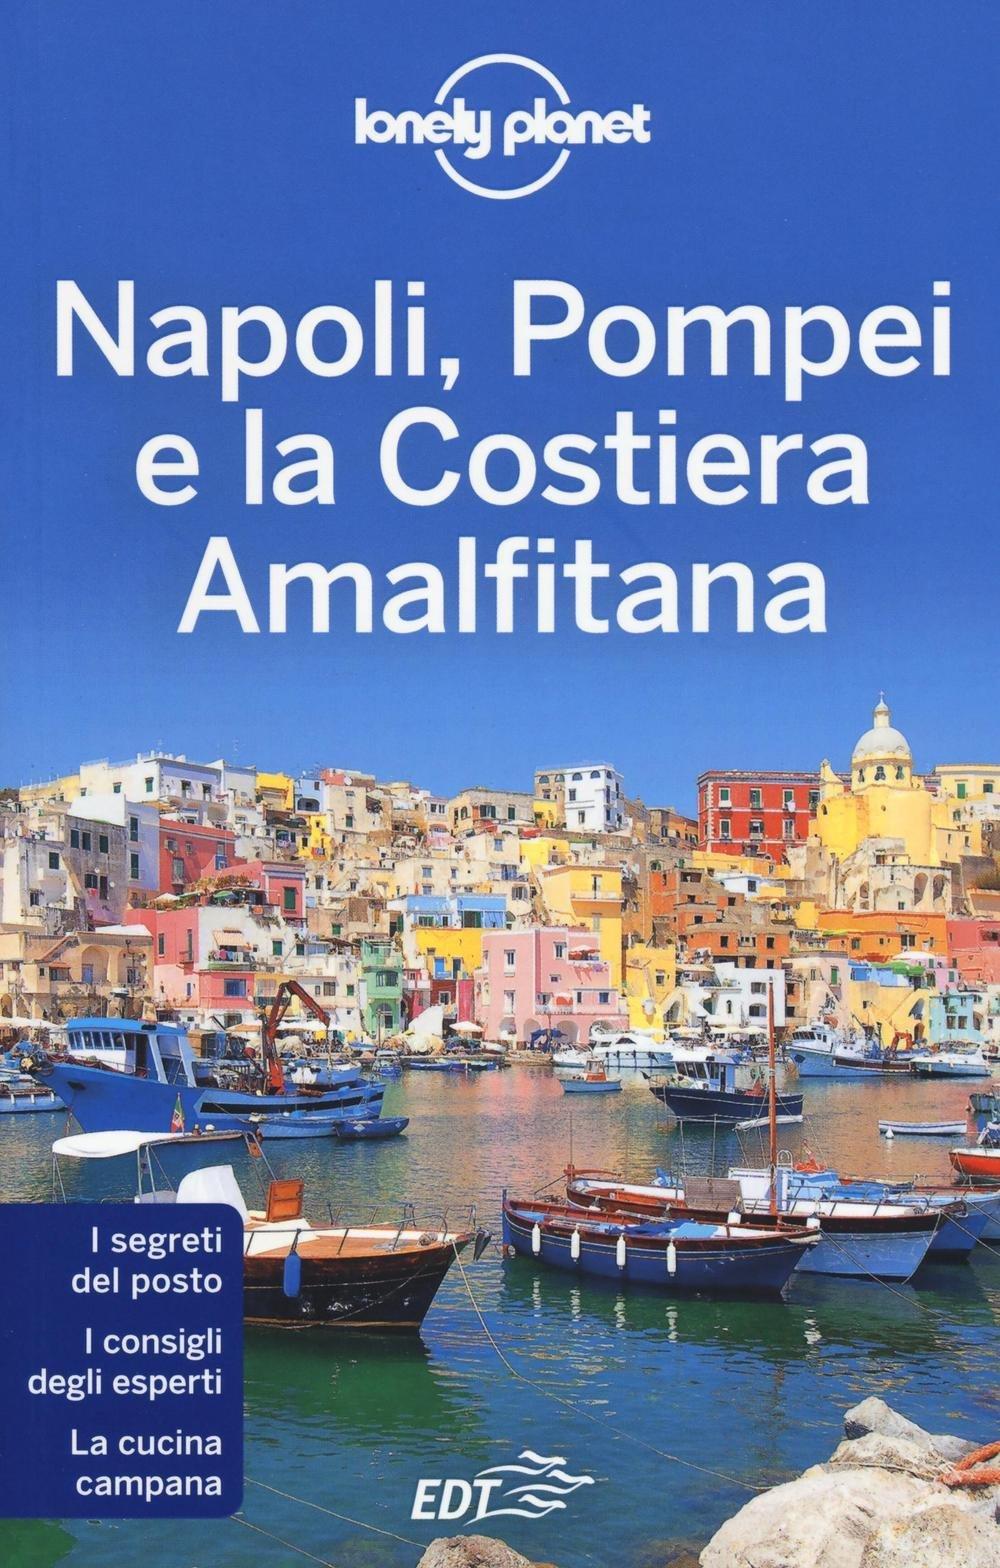 Napoli, Pompei e la Costiera amalfitana Copertina flessibile – 19 mag 2016 Cristian Bonetto Helena Smith EDT 8859225825